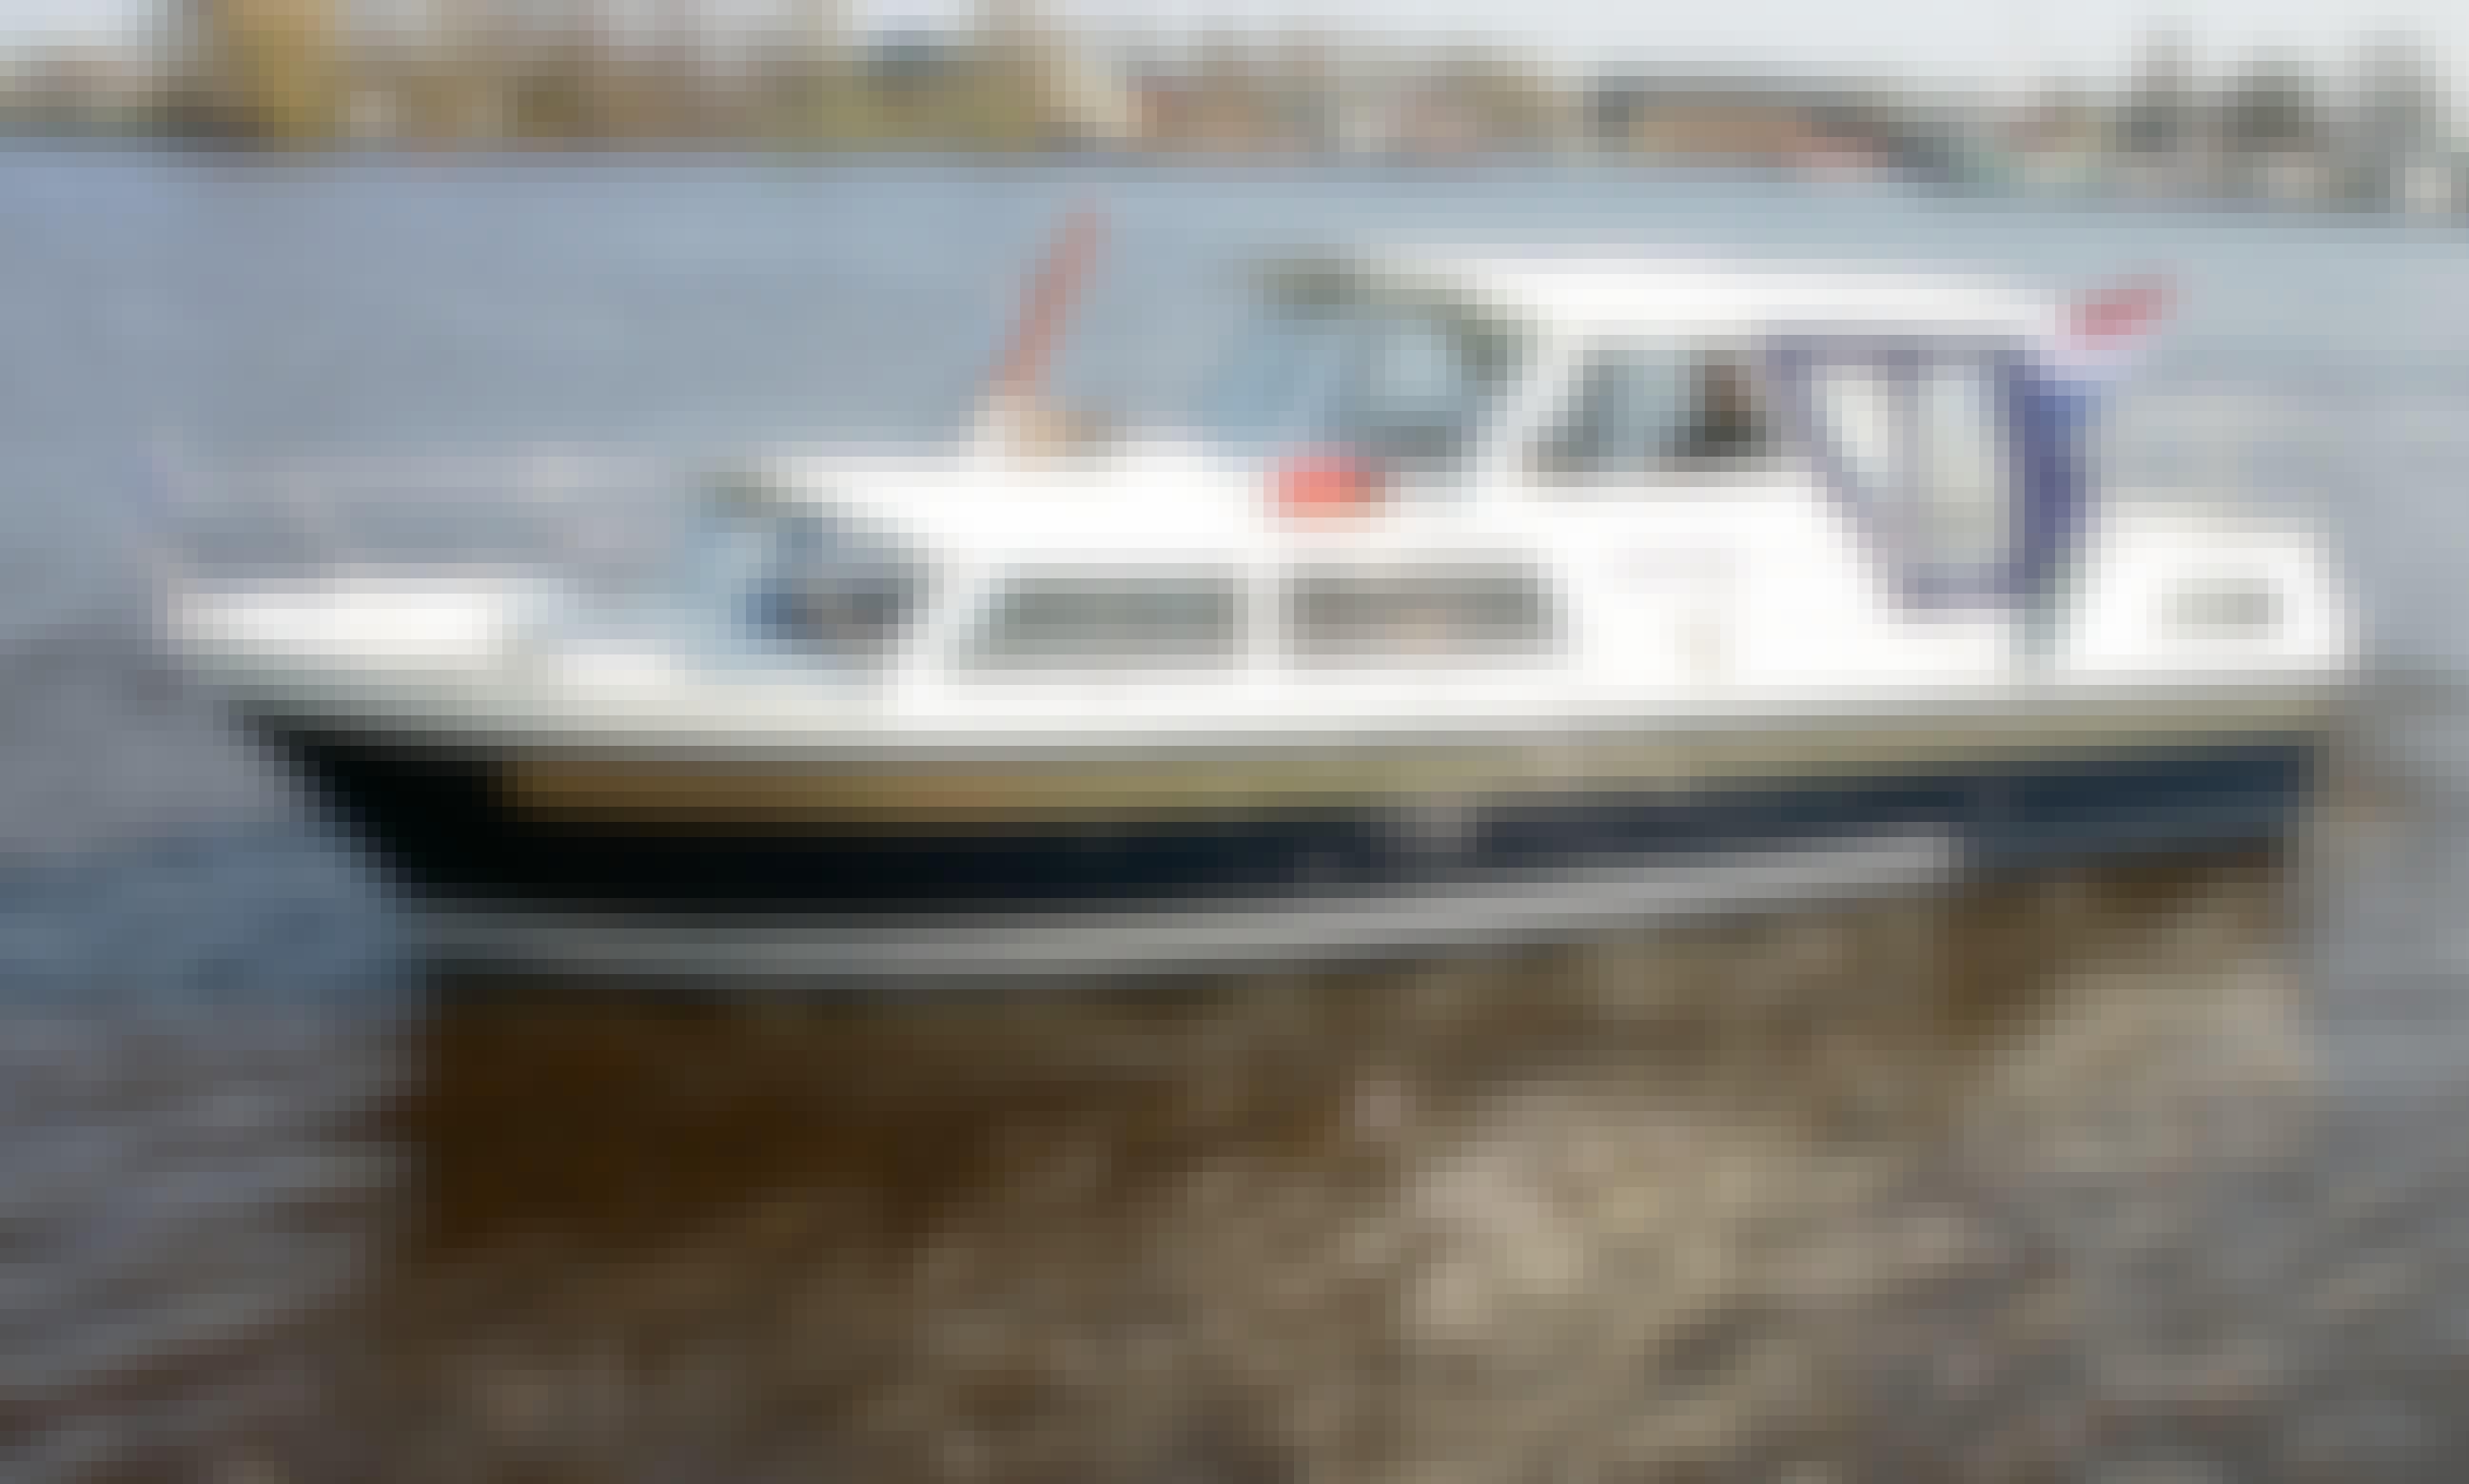 27' Tjeukemeer 900 Motor Yacht Rental in Friesland, Netherlands